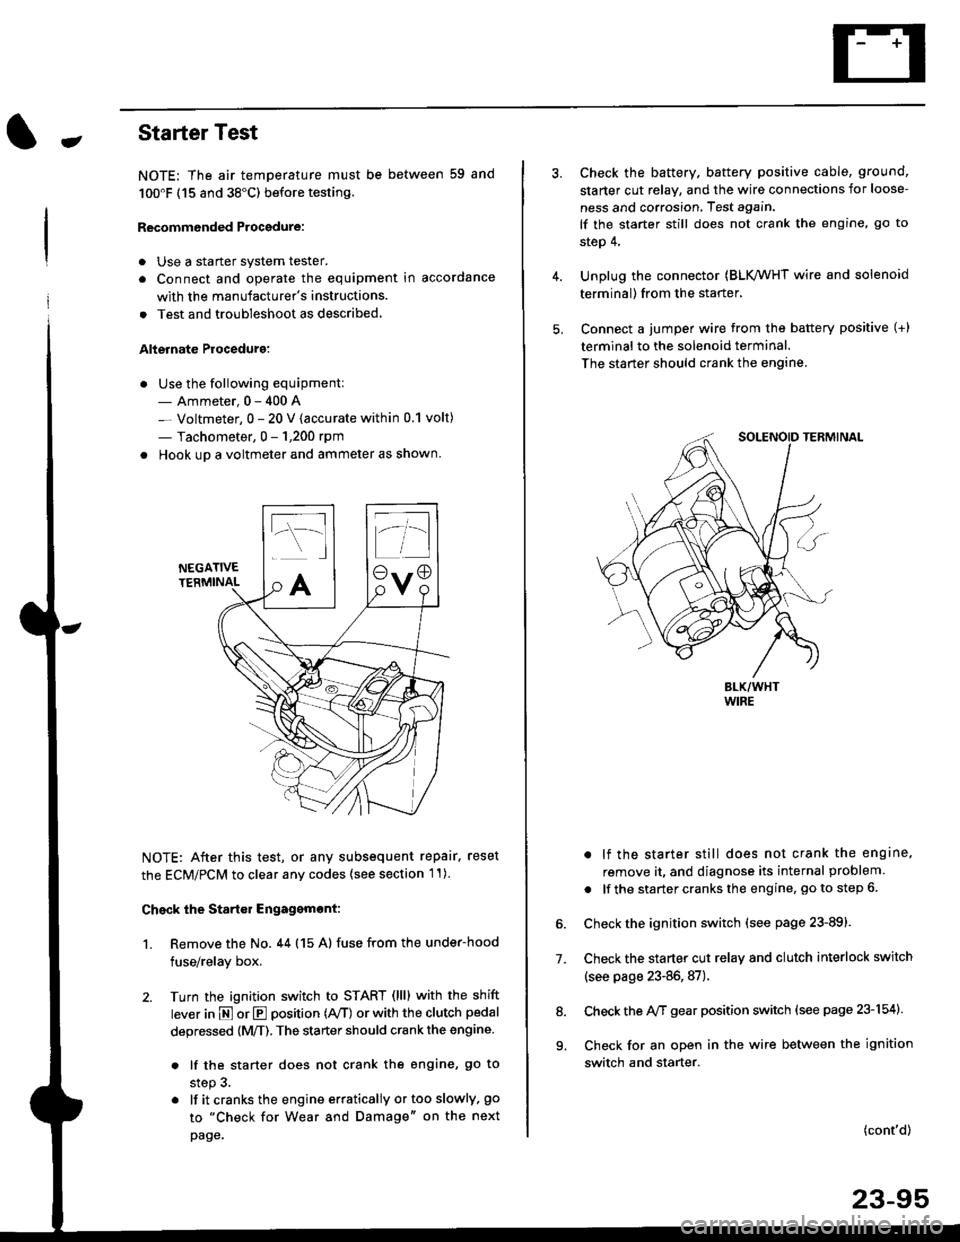 medium resolution of honda civic 1998 6 g workshop manual page 1565